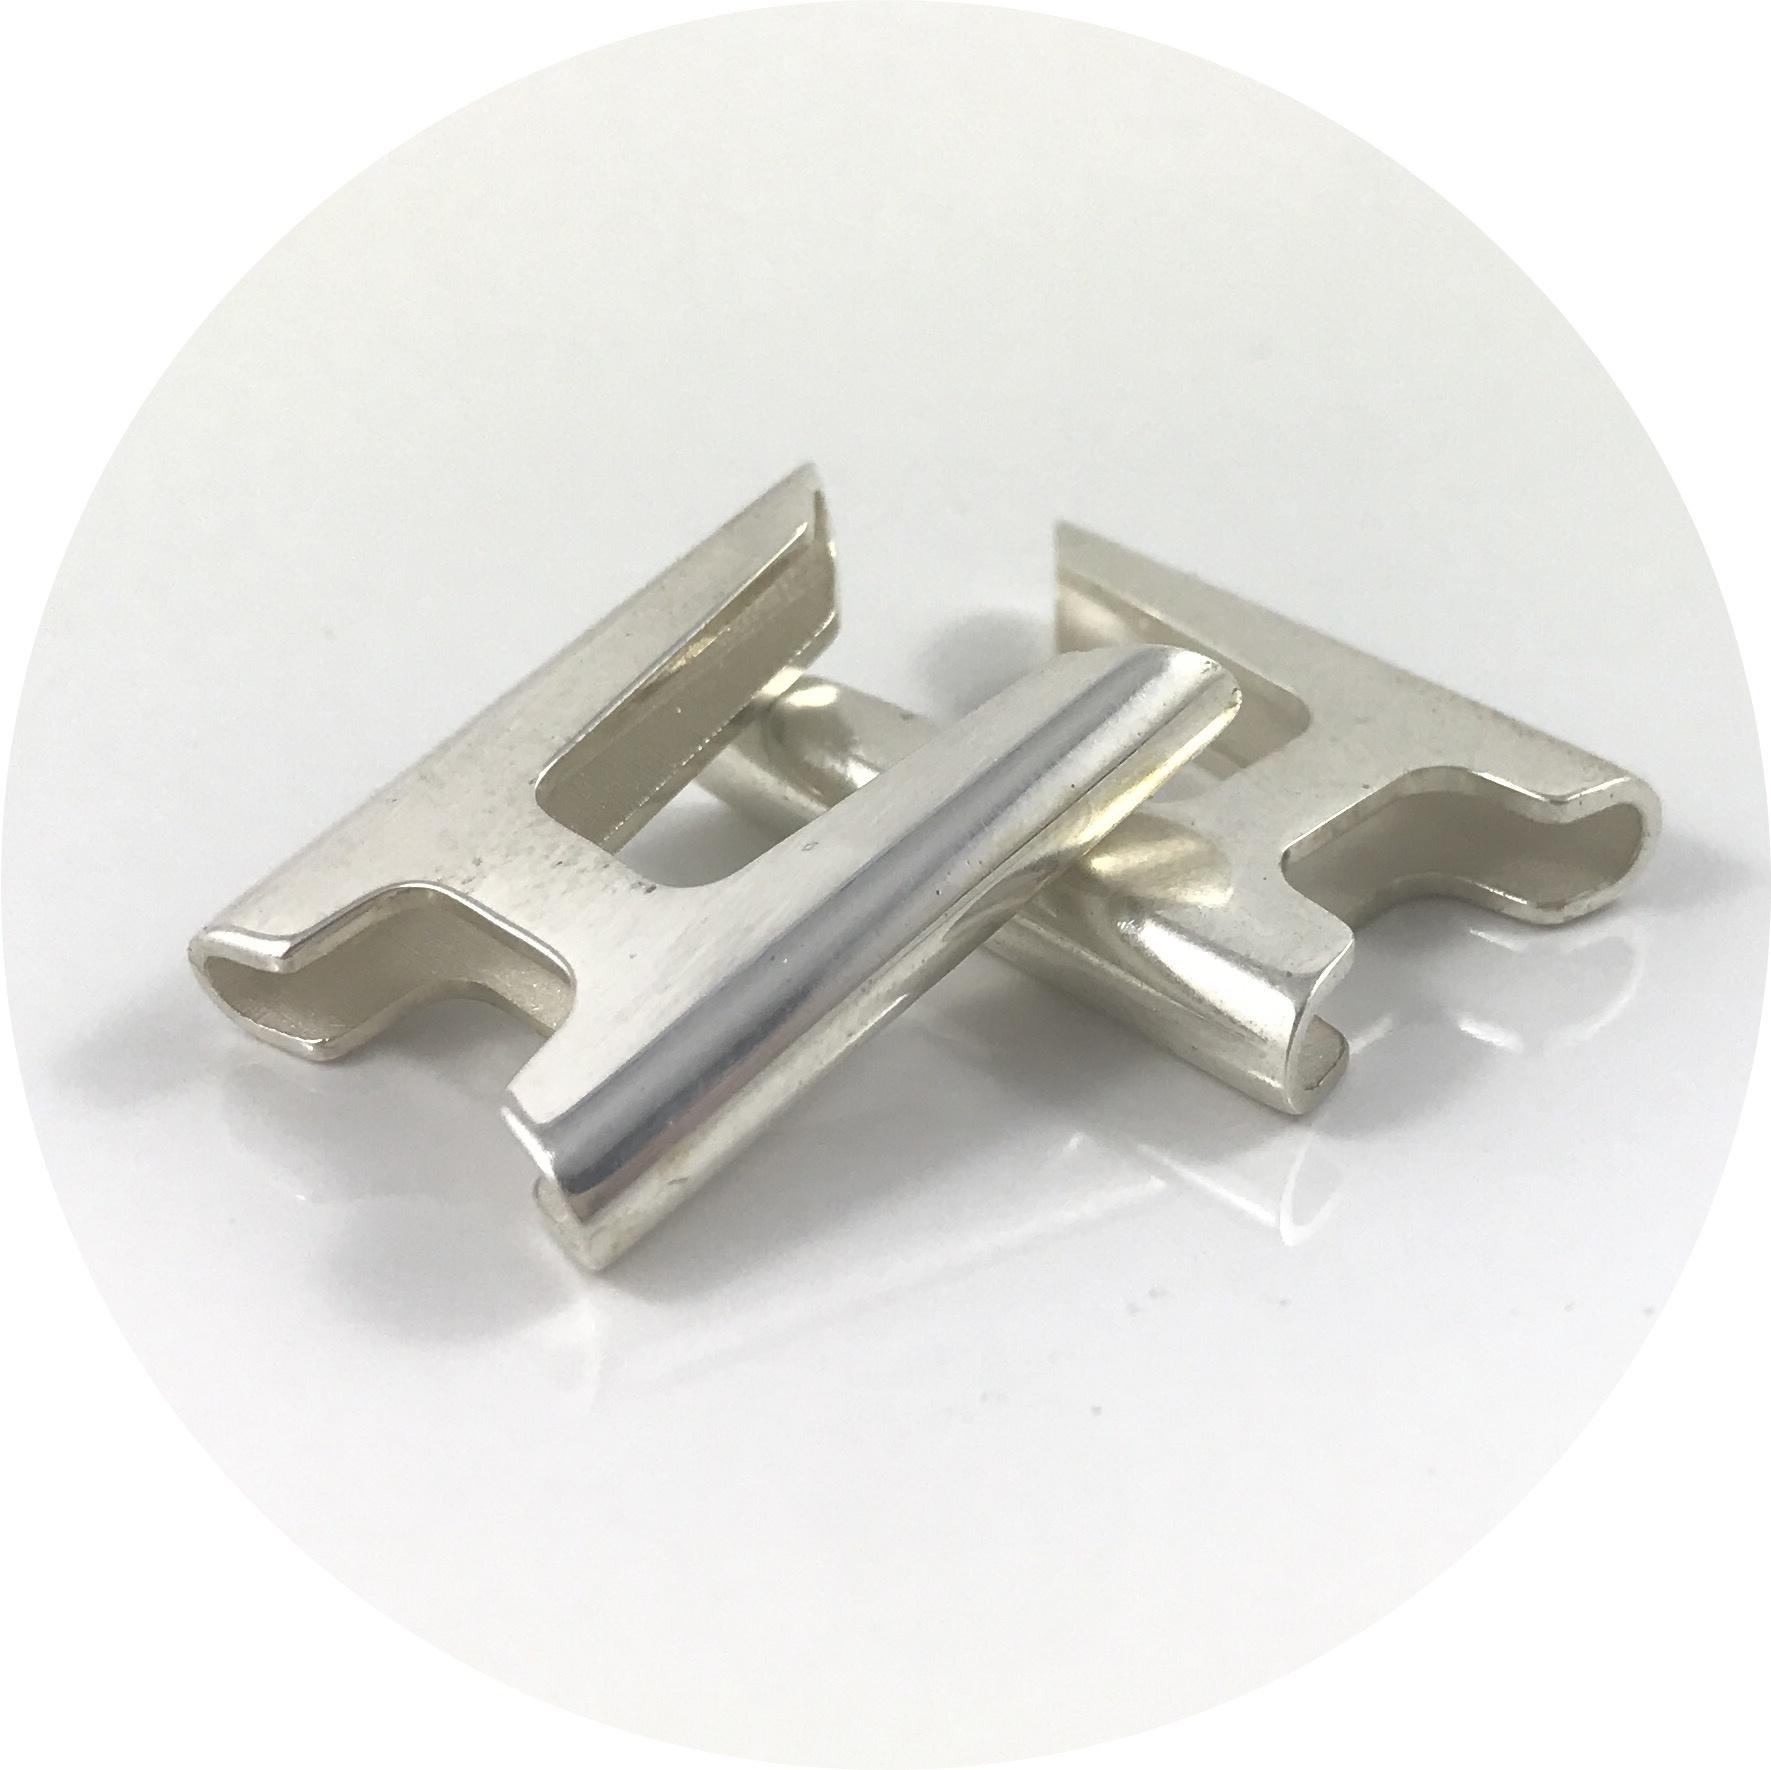 Carl Noonan- Constant Cufflinks, 925 Sterling Silver